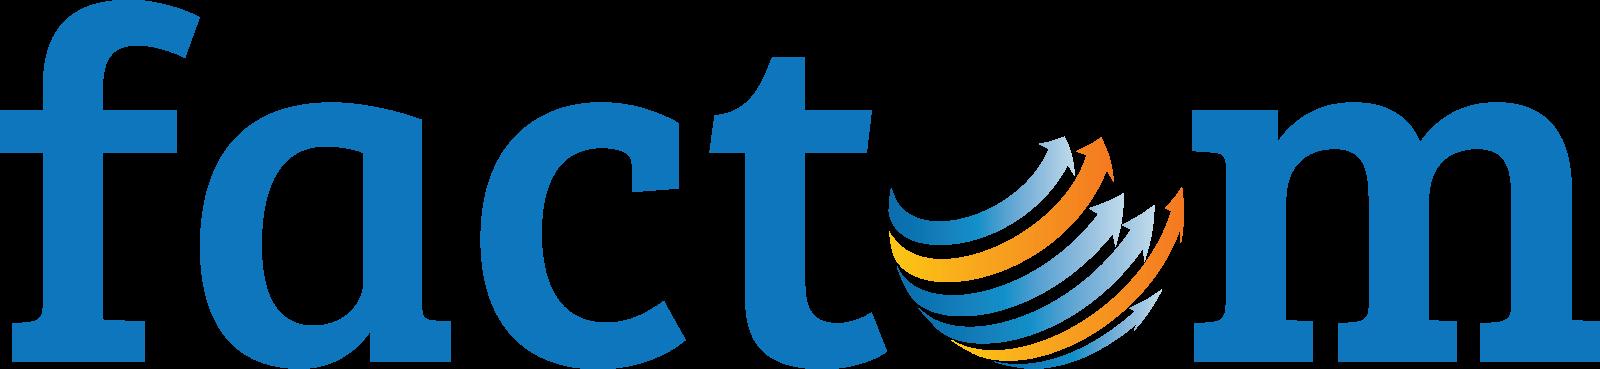 factom_logo_trans-3